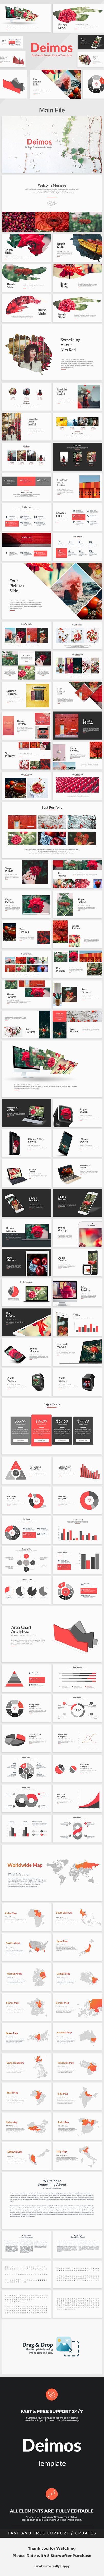 Deimos Business Presentation Template — Powerpoint PPT #branding #bara • Download ➝ https://graphicriver.net/item/deimos-business-presentation-template/19235822?ref=pxcr